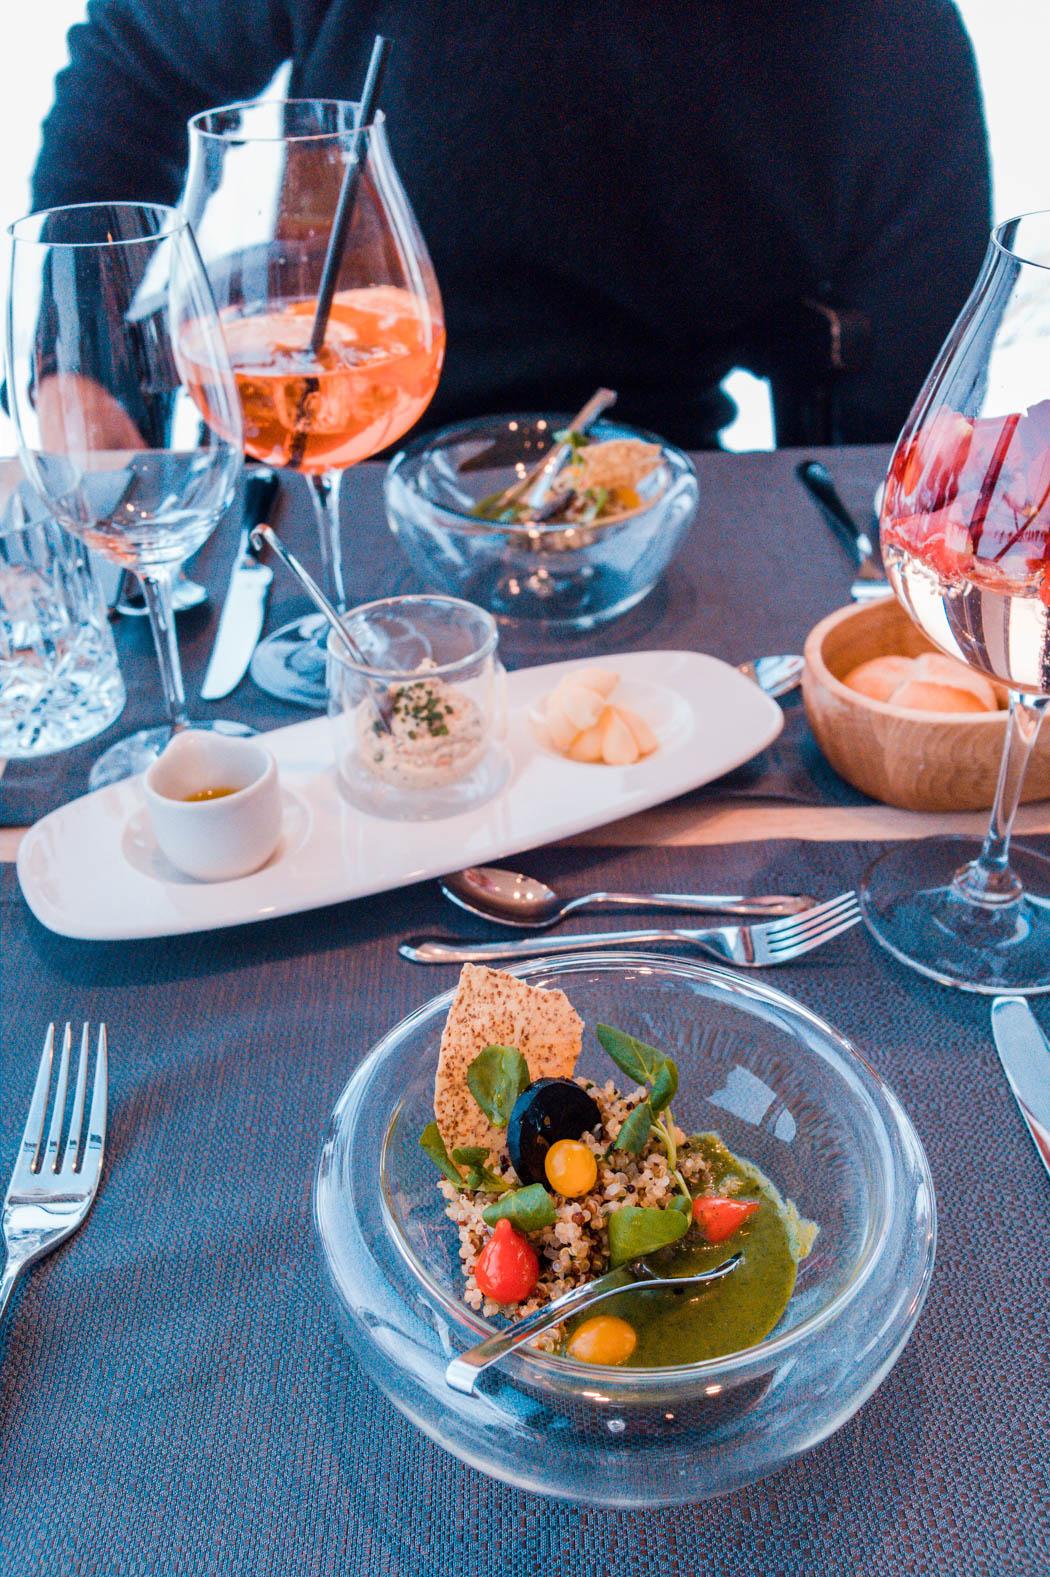 foodblog-foodblogger-food-blog-blogger-iceq-soelden-james-bond-location-berg-spectre-6